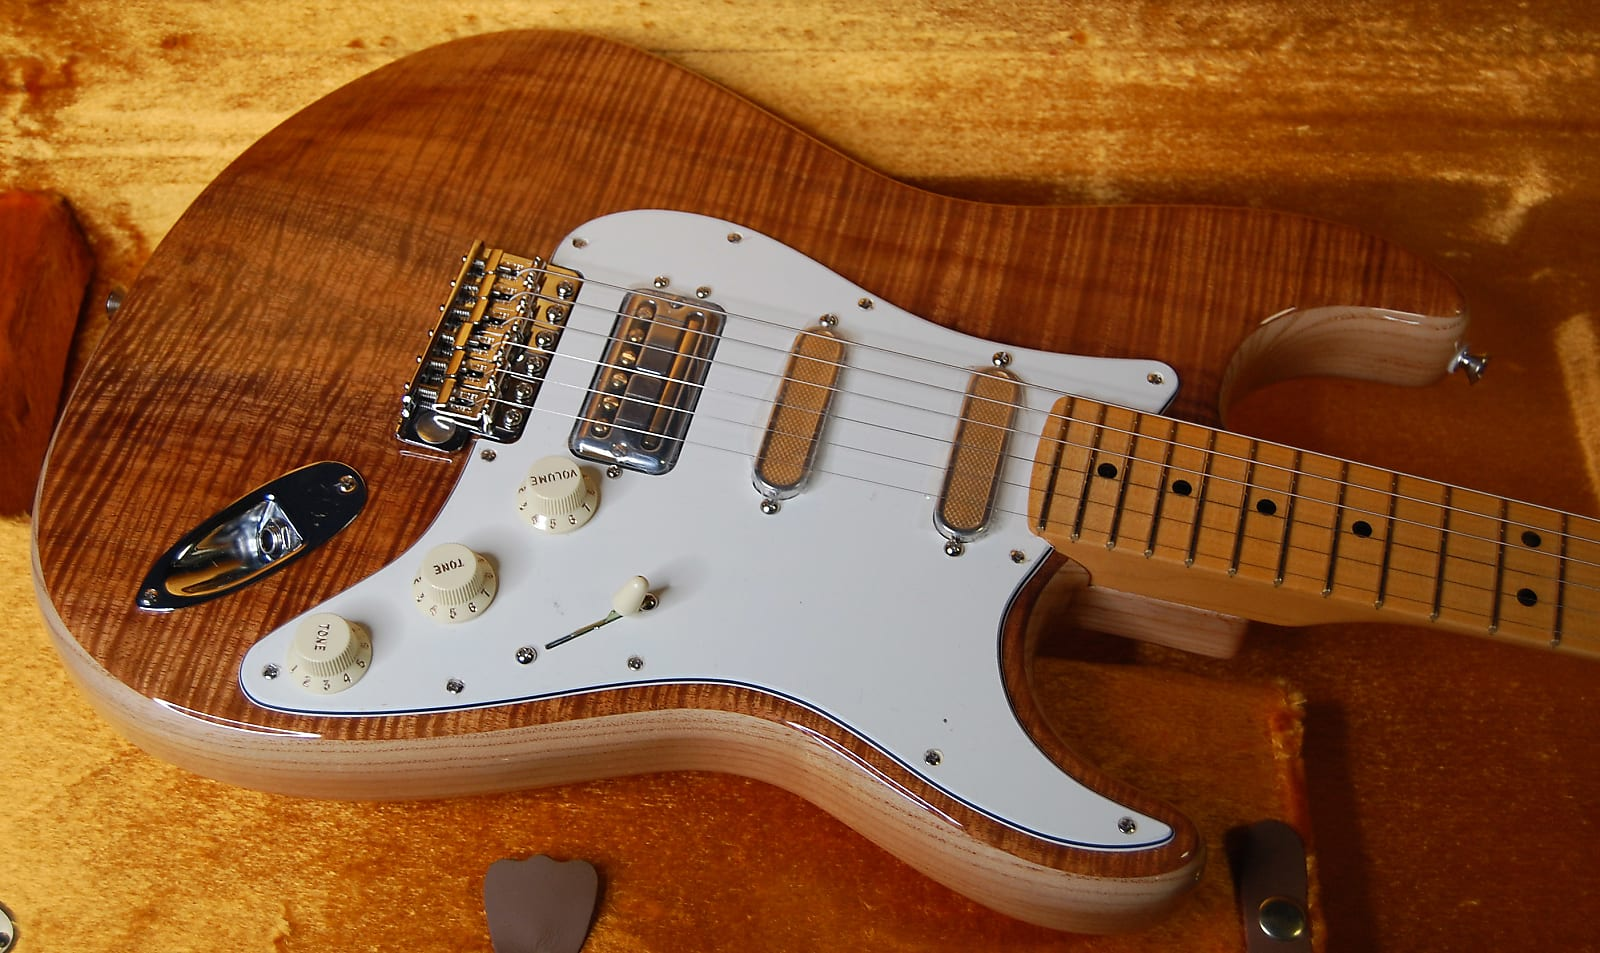 NEW! Fender Rarities USA Flame Koa Top Stratocaster - Authorized Dealer - Pre-Order!